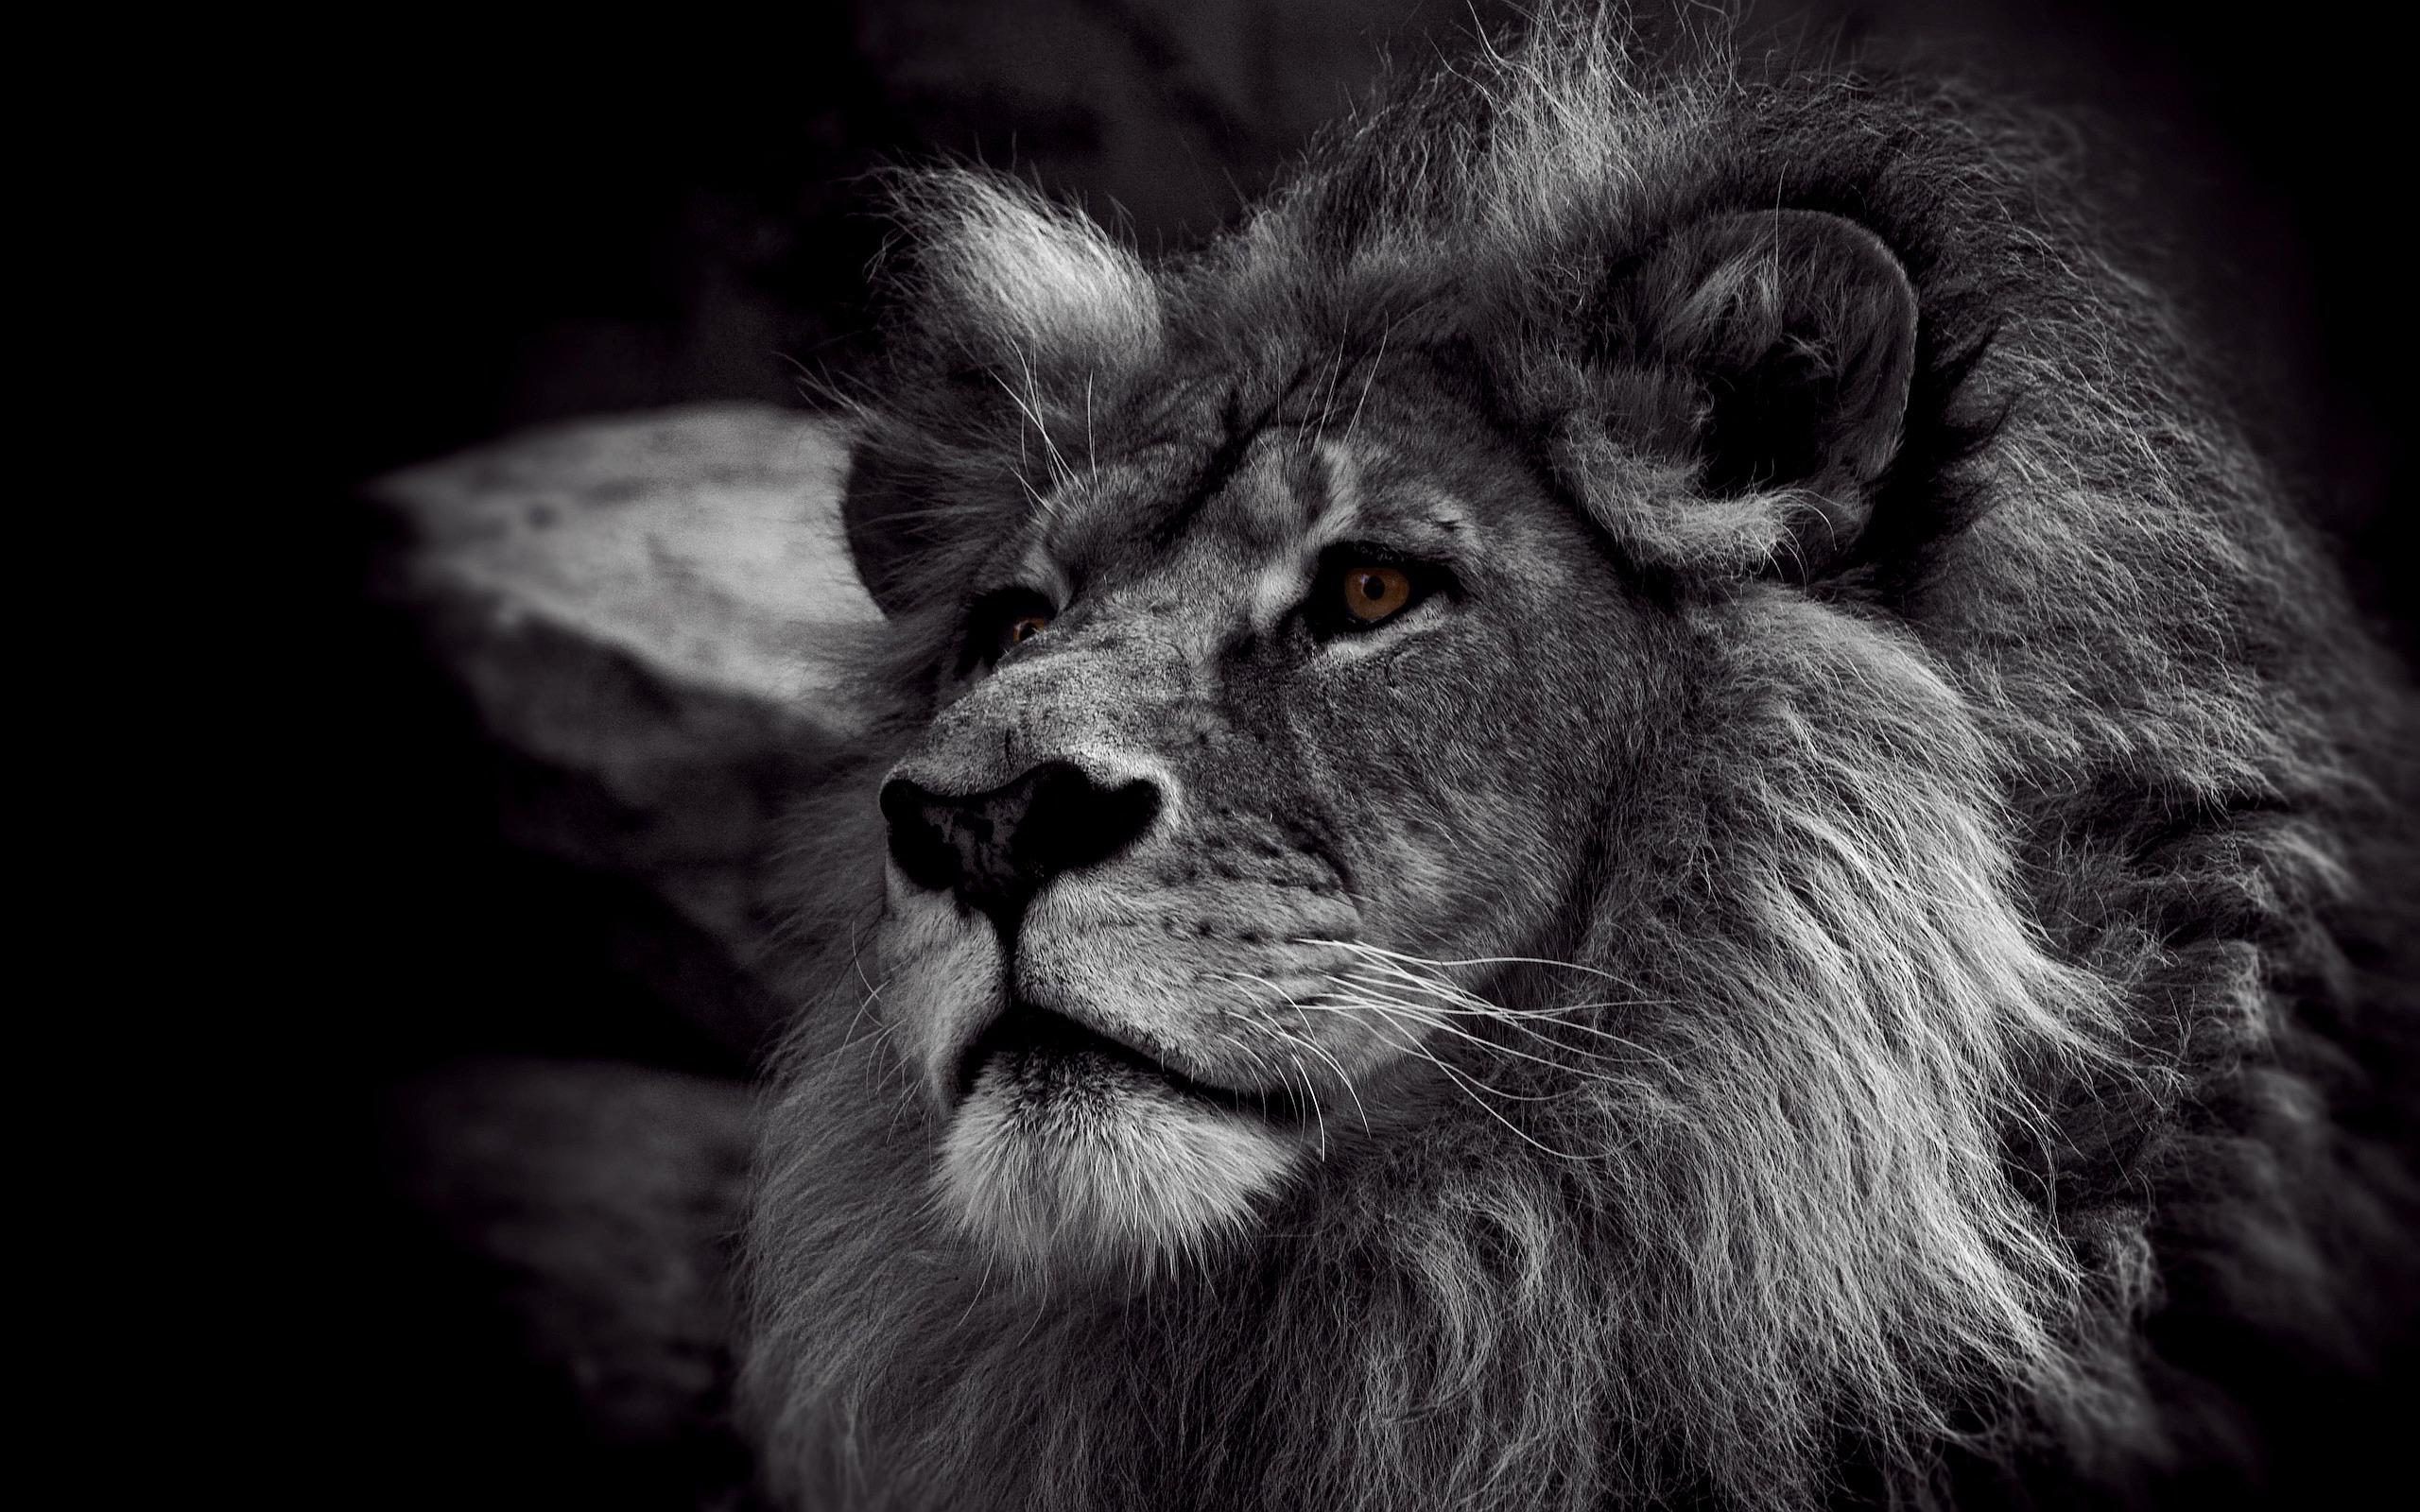 Black Lion Hd Desktop Wallpapers 4k Hd